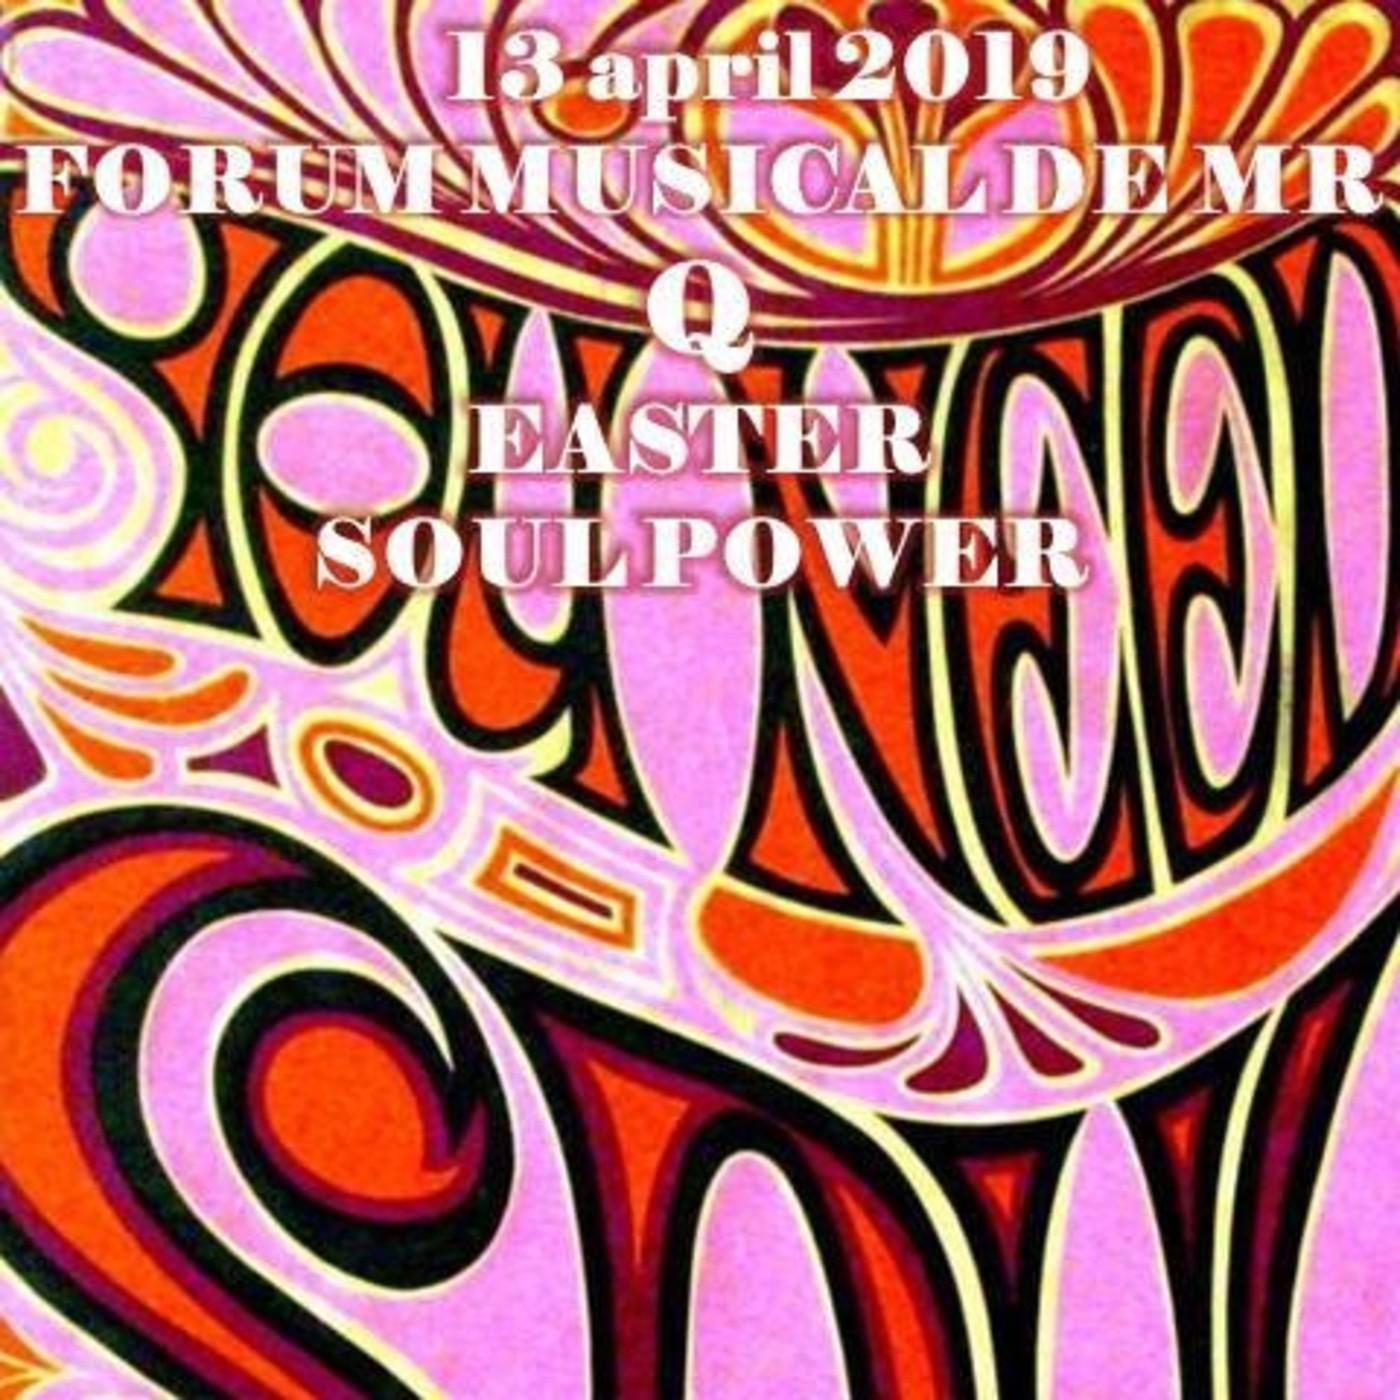 Forum musical de mr q # 585 easter funky soul power